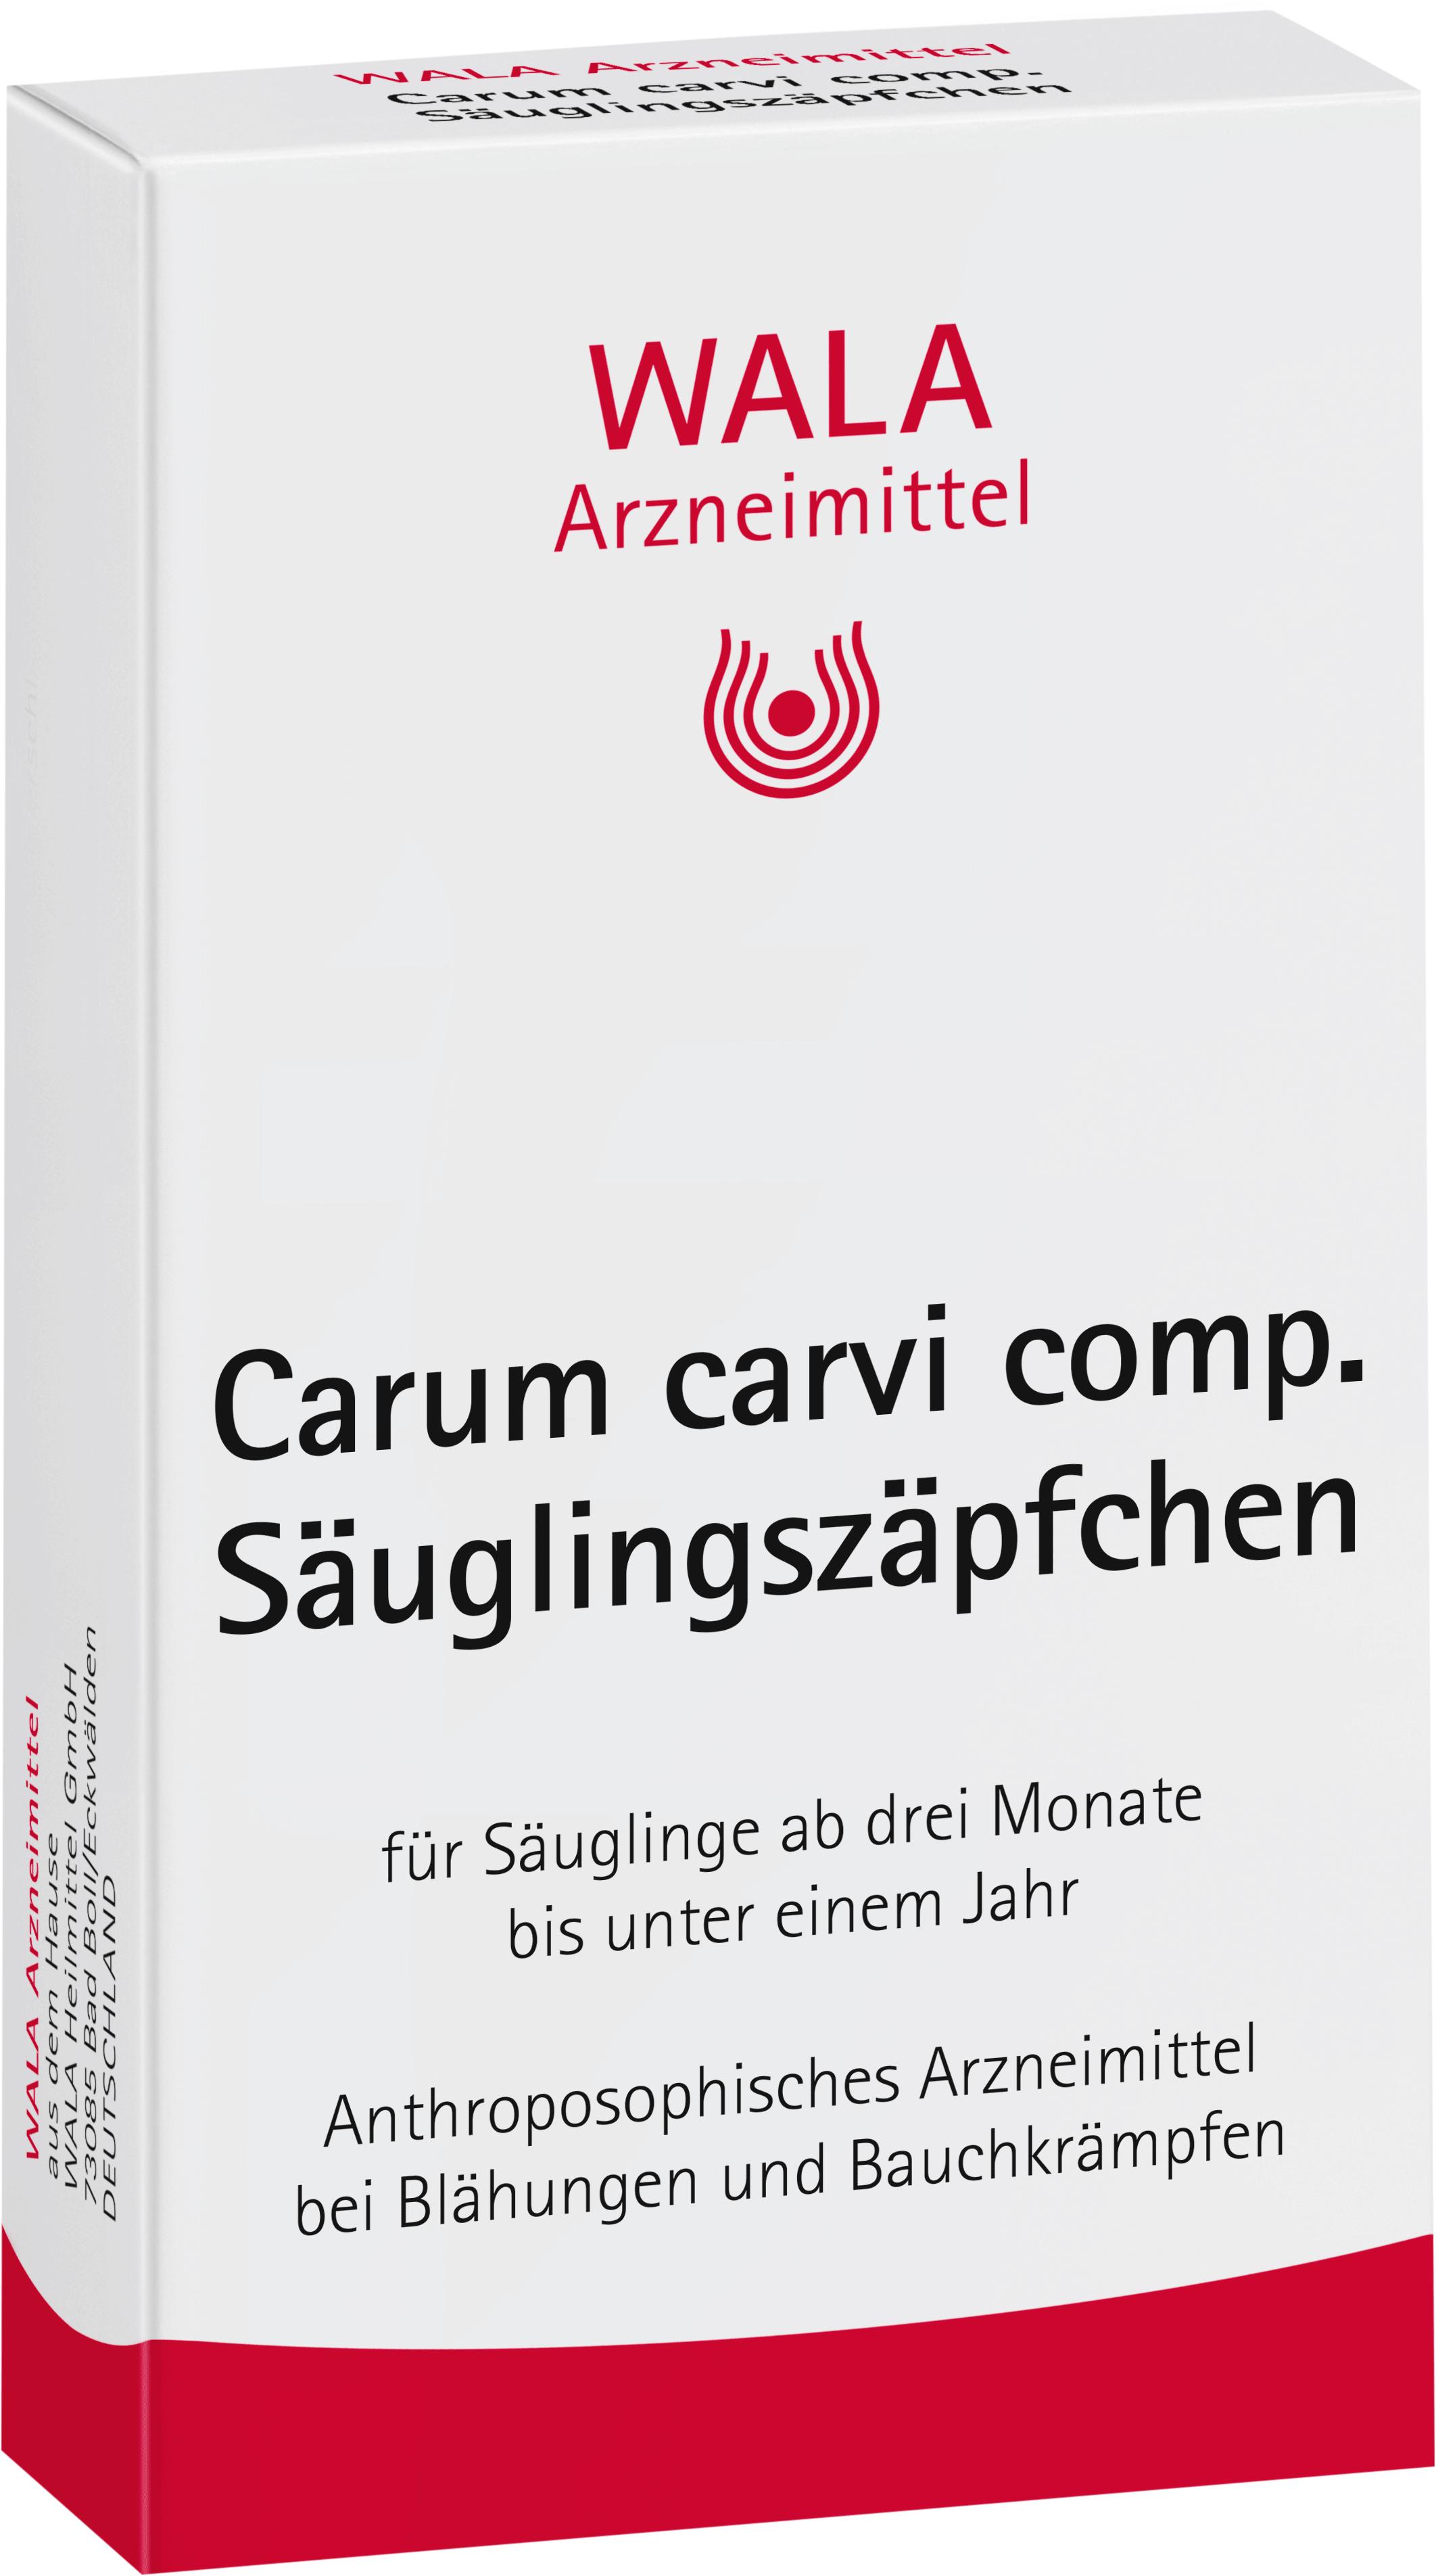 Carum carvi comp. Säuglingszäpfchen